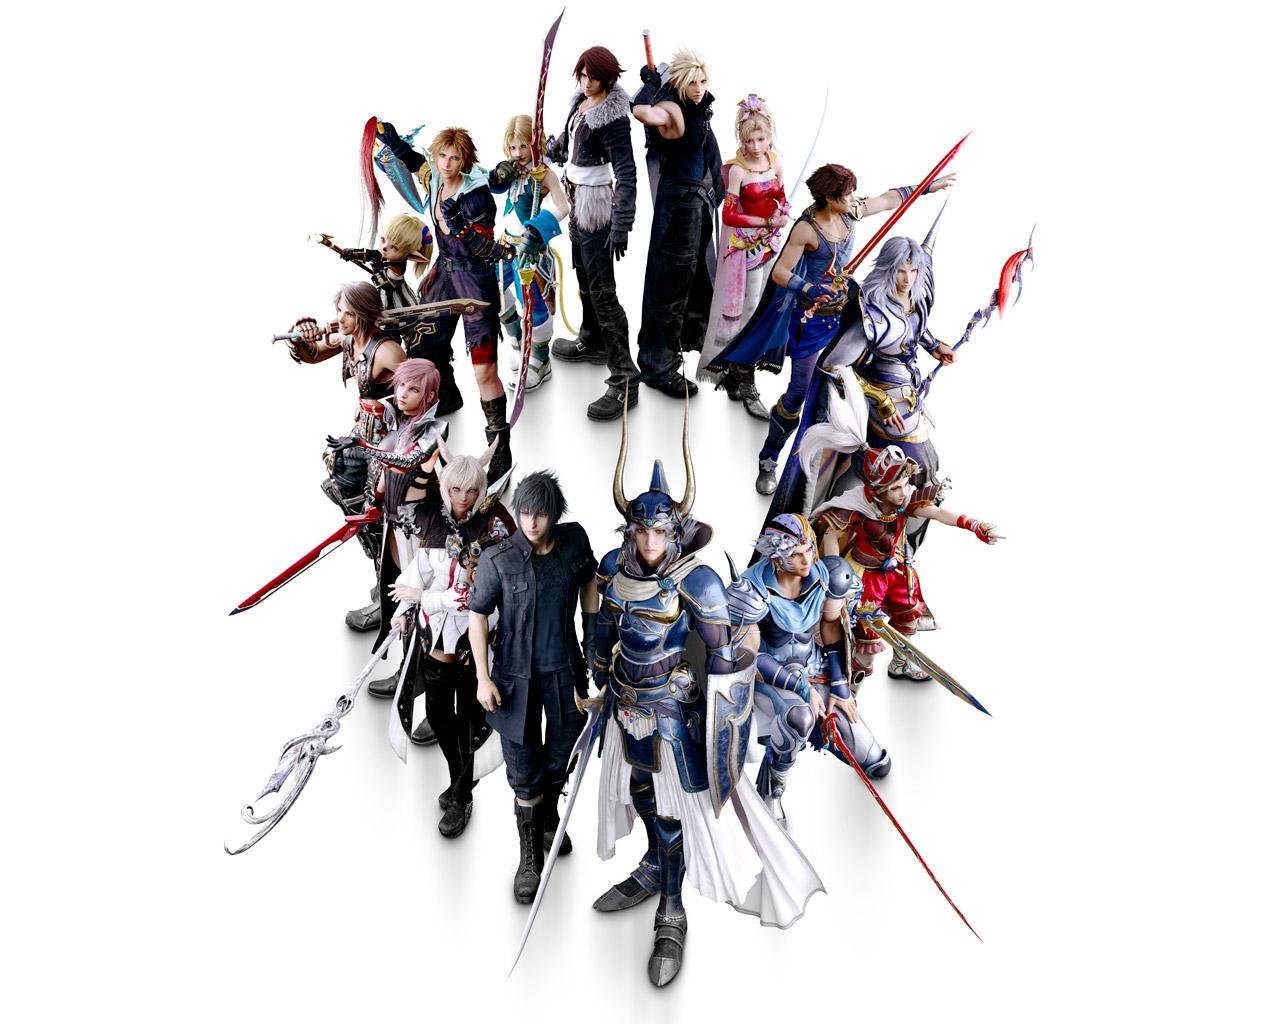 Free Dissidia Final Fantasy NT Wallpaper in 1280x1024